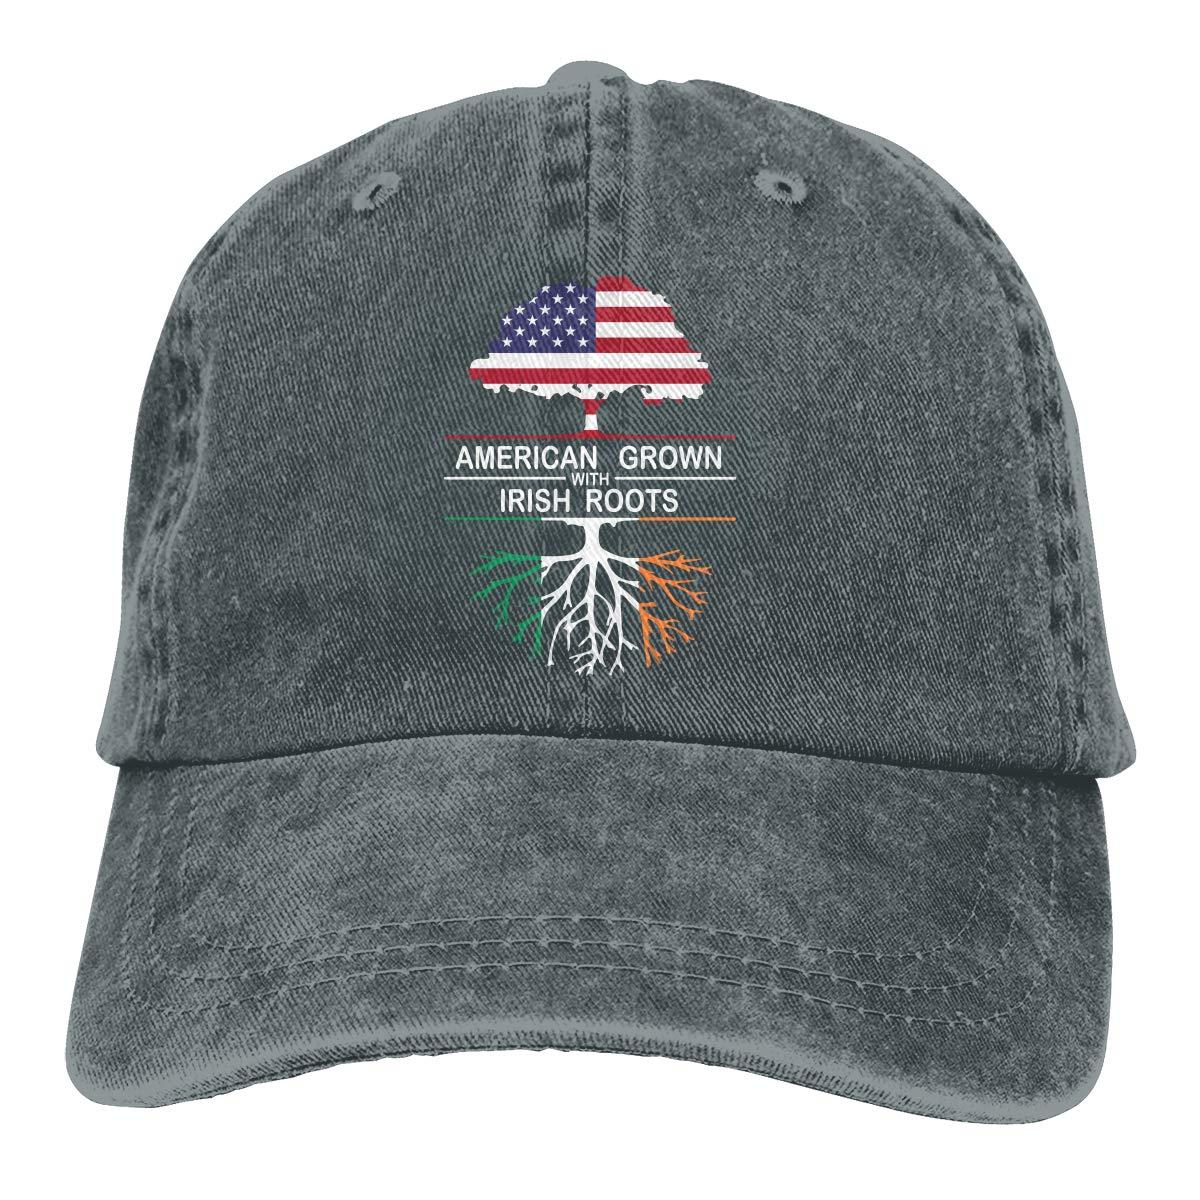 American Grown with Irish Roots-1 Adult Custom Cowboy Sun Hat Adjustable Baseball Cap